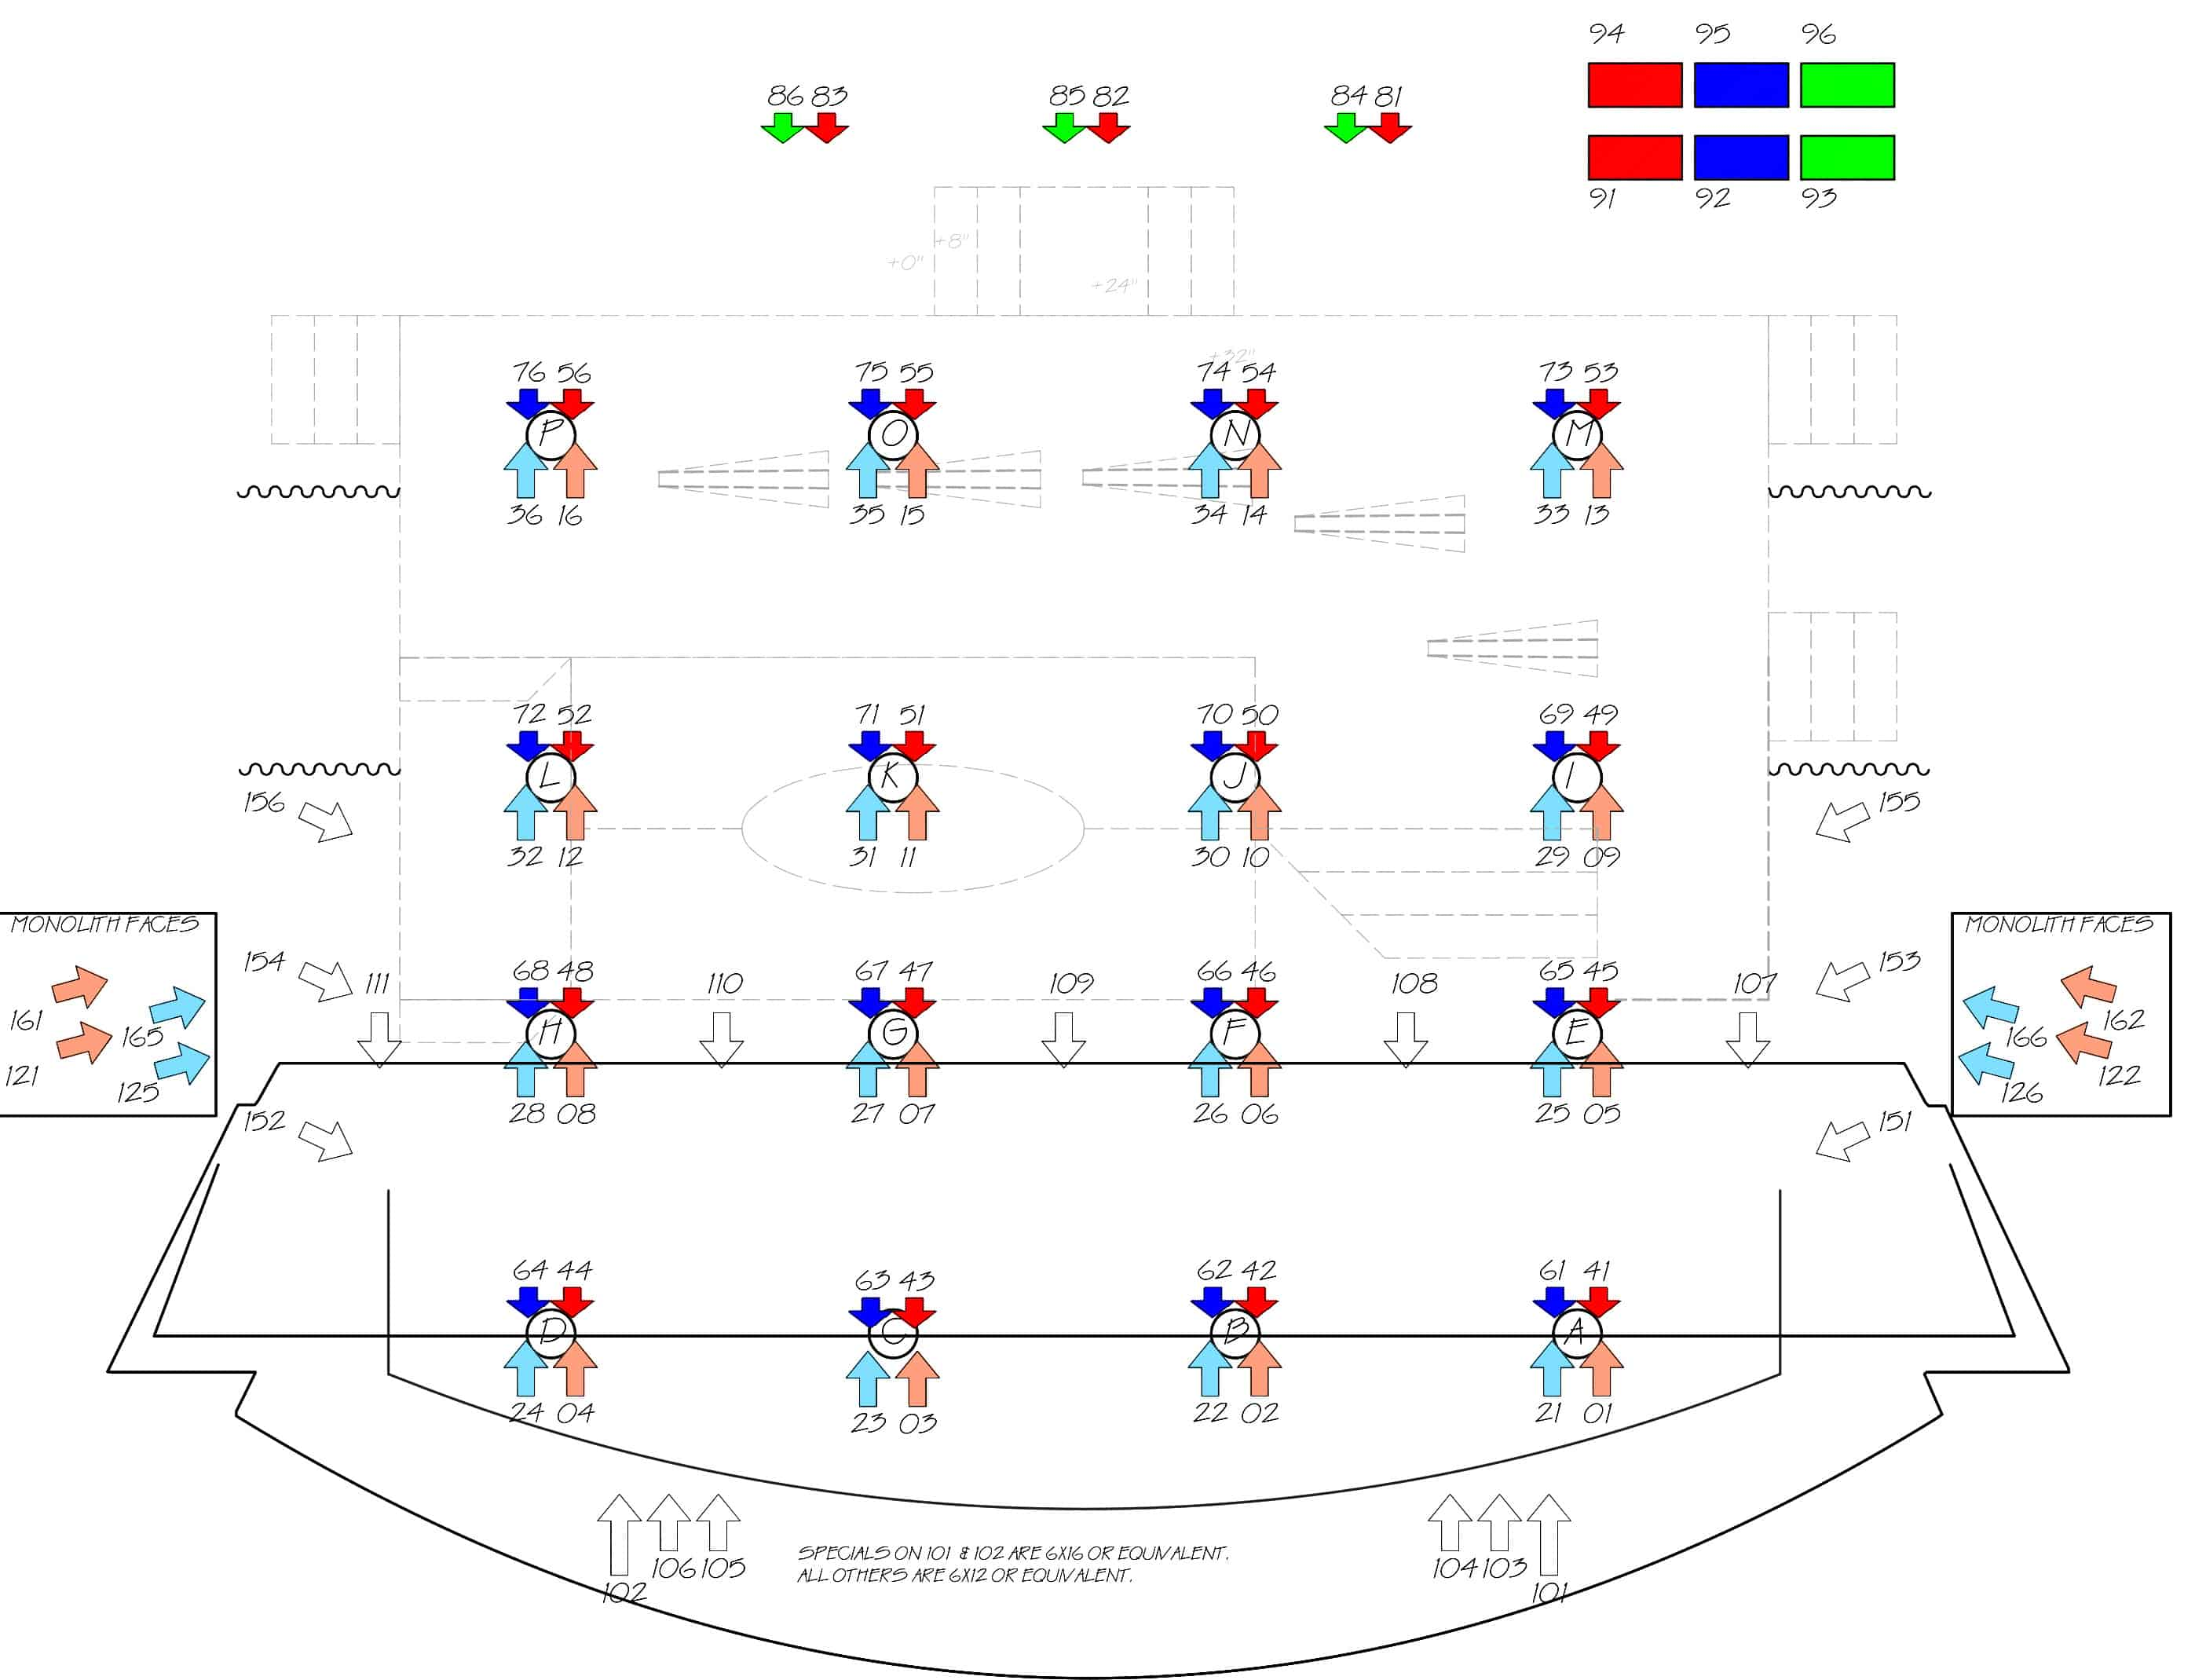 C:UsersmkizerDocumentsdesign16-17oedipuslighting designA